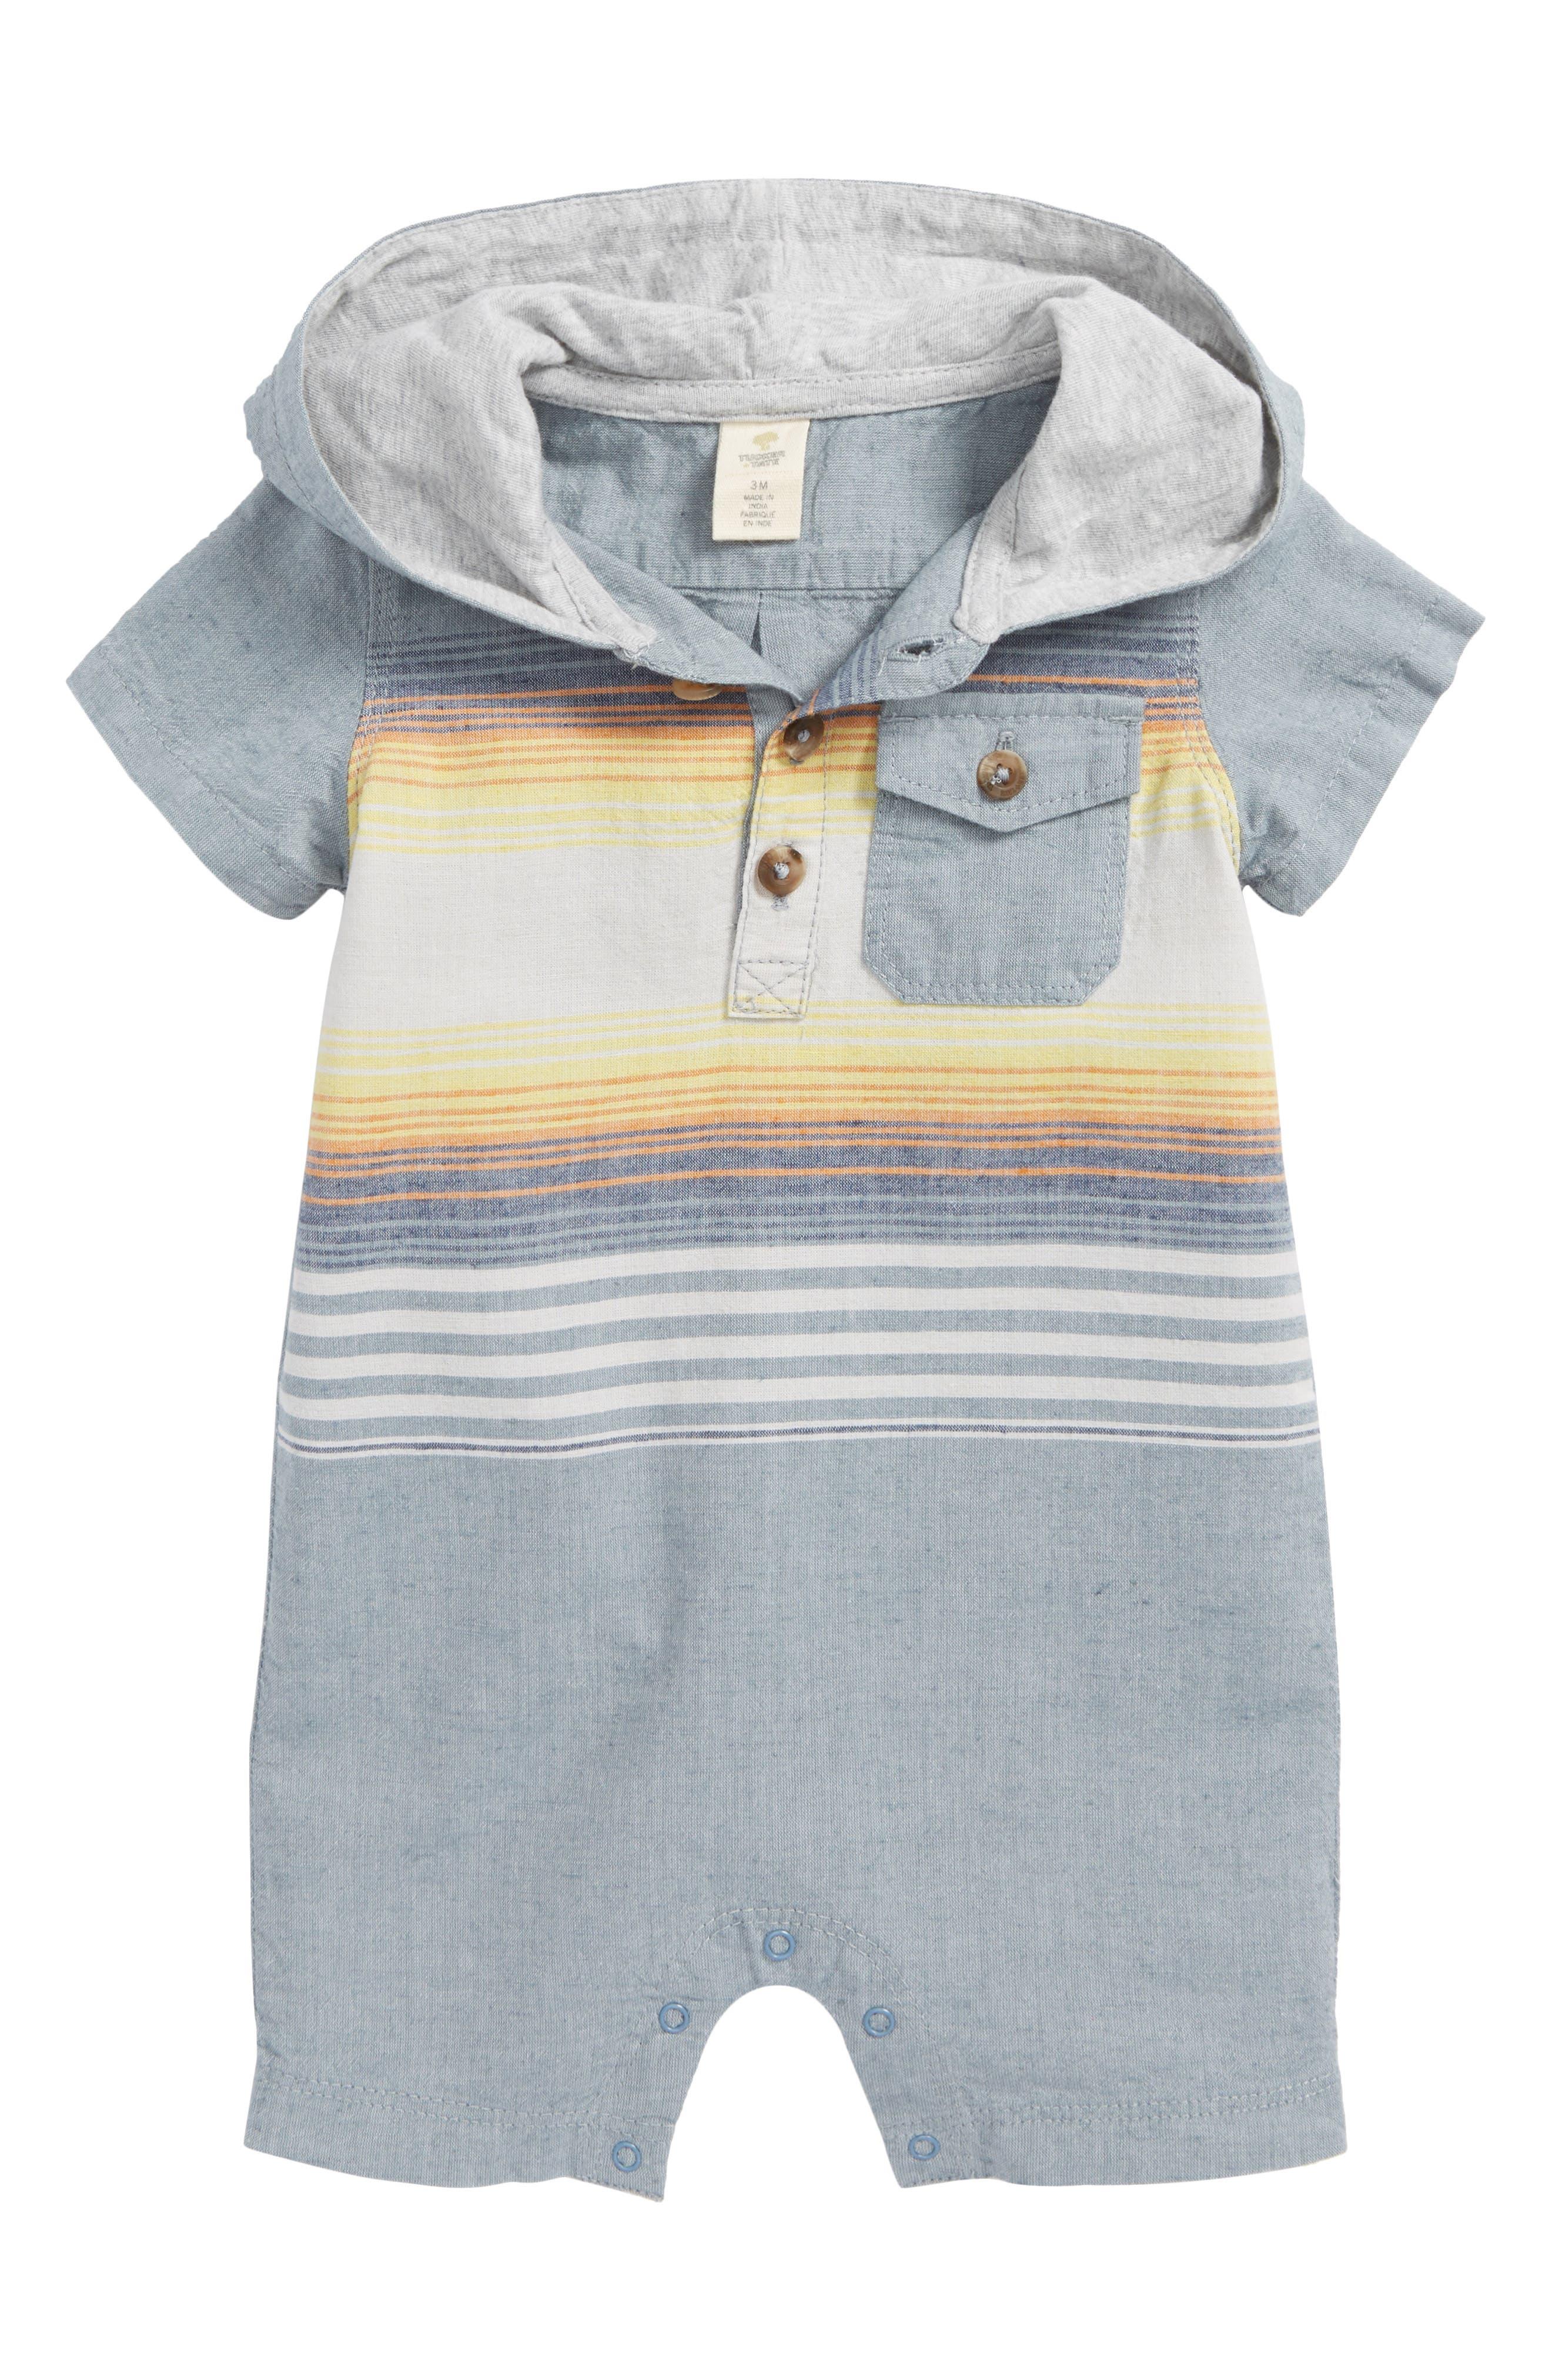 Stripe Hooded Romper,                             Main thumbnail 1, color,                             Blue Chambray Sunset Stripe